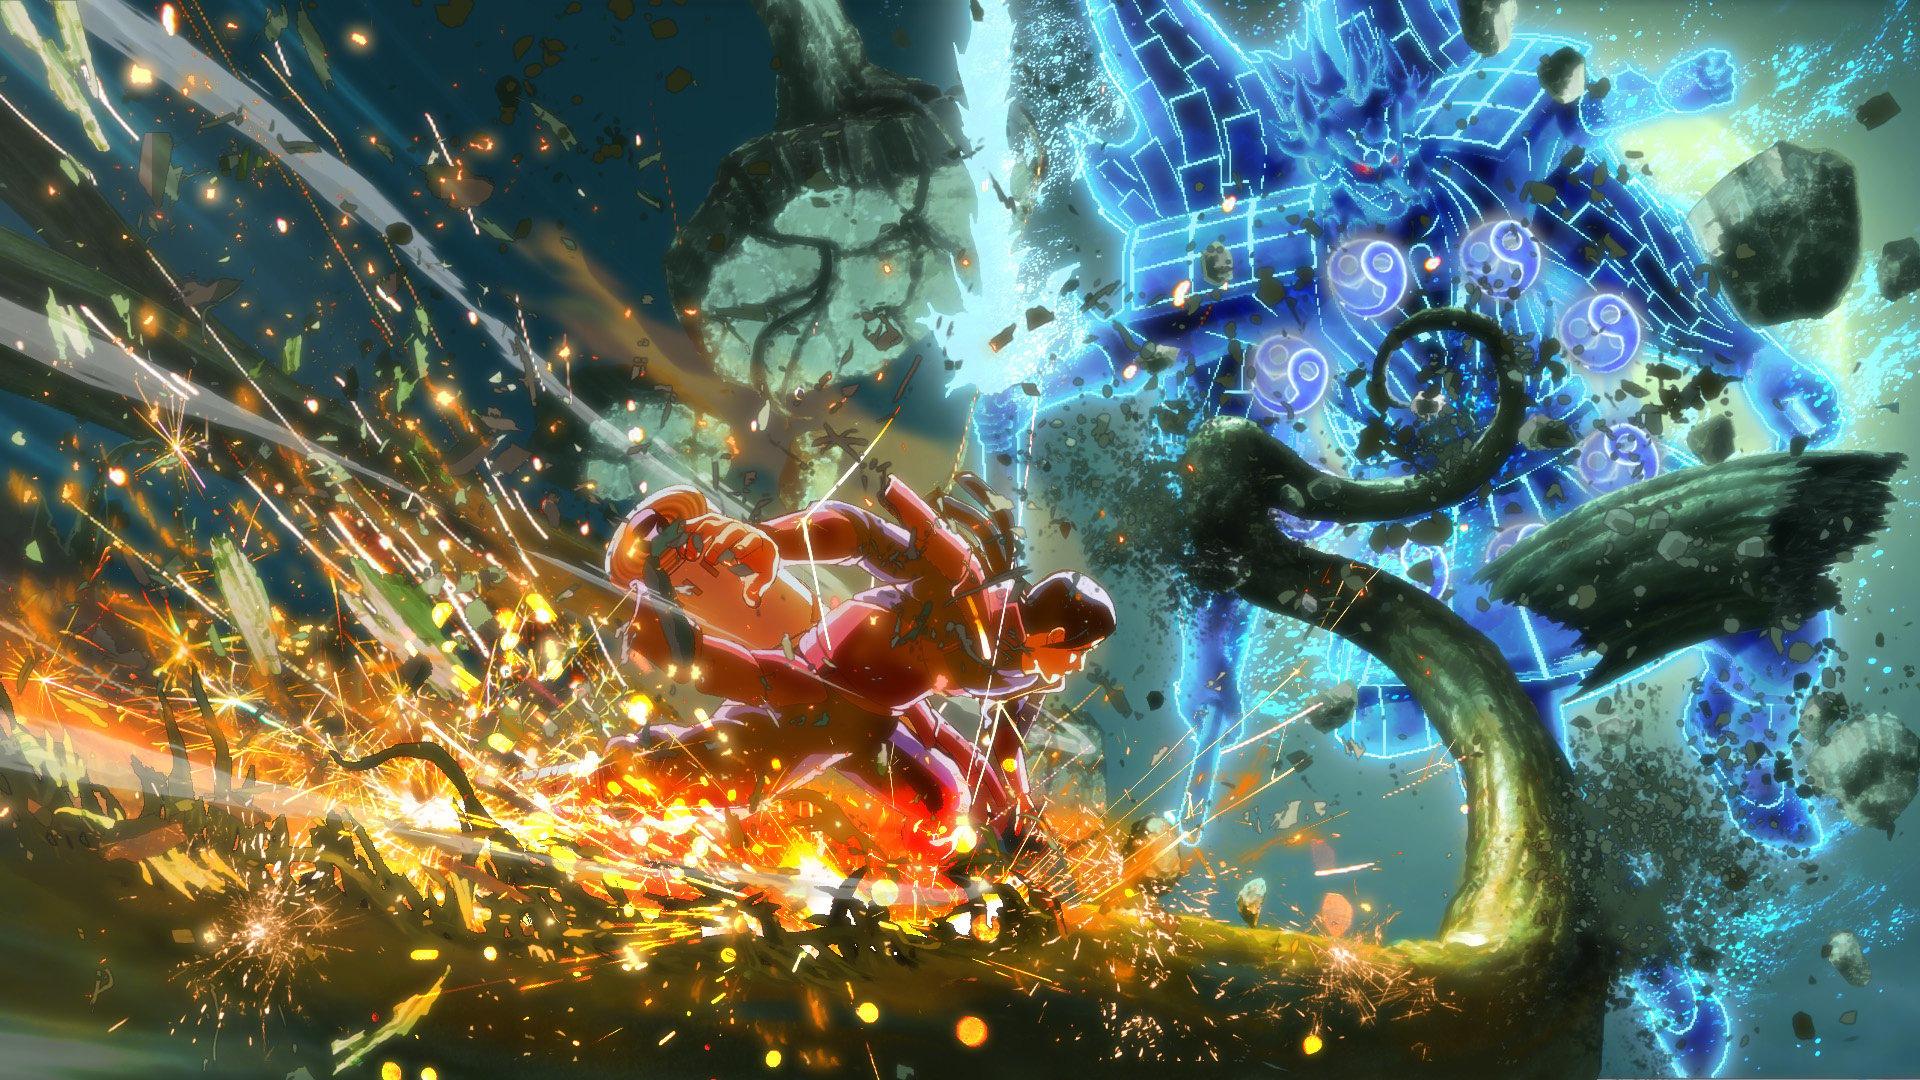 Naruto Shippuden: Ultimate Ninja Storm 4 Conjures a